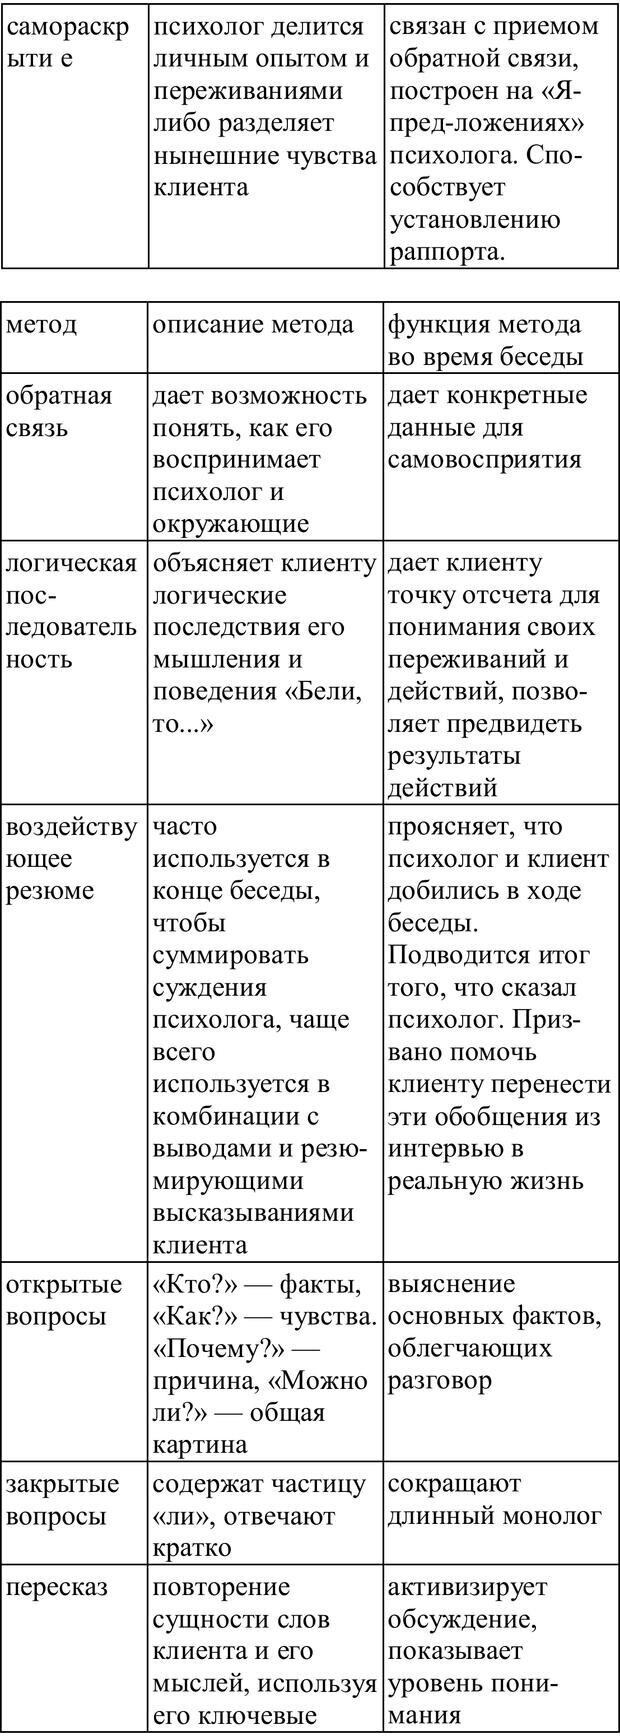 PDF. Практическая психология. Абрамова Г. С. Страница 92. Читать онлайн